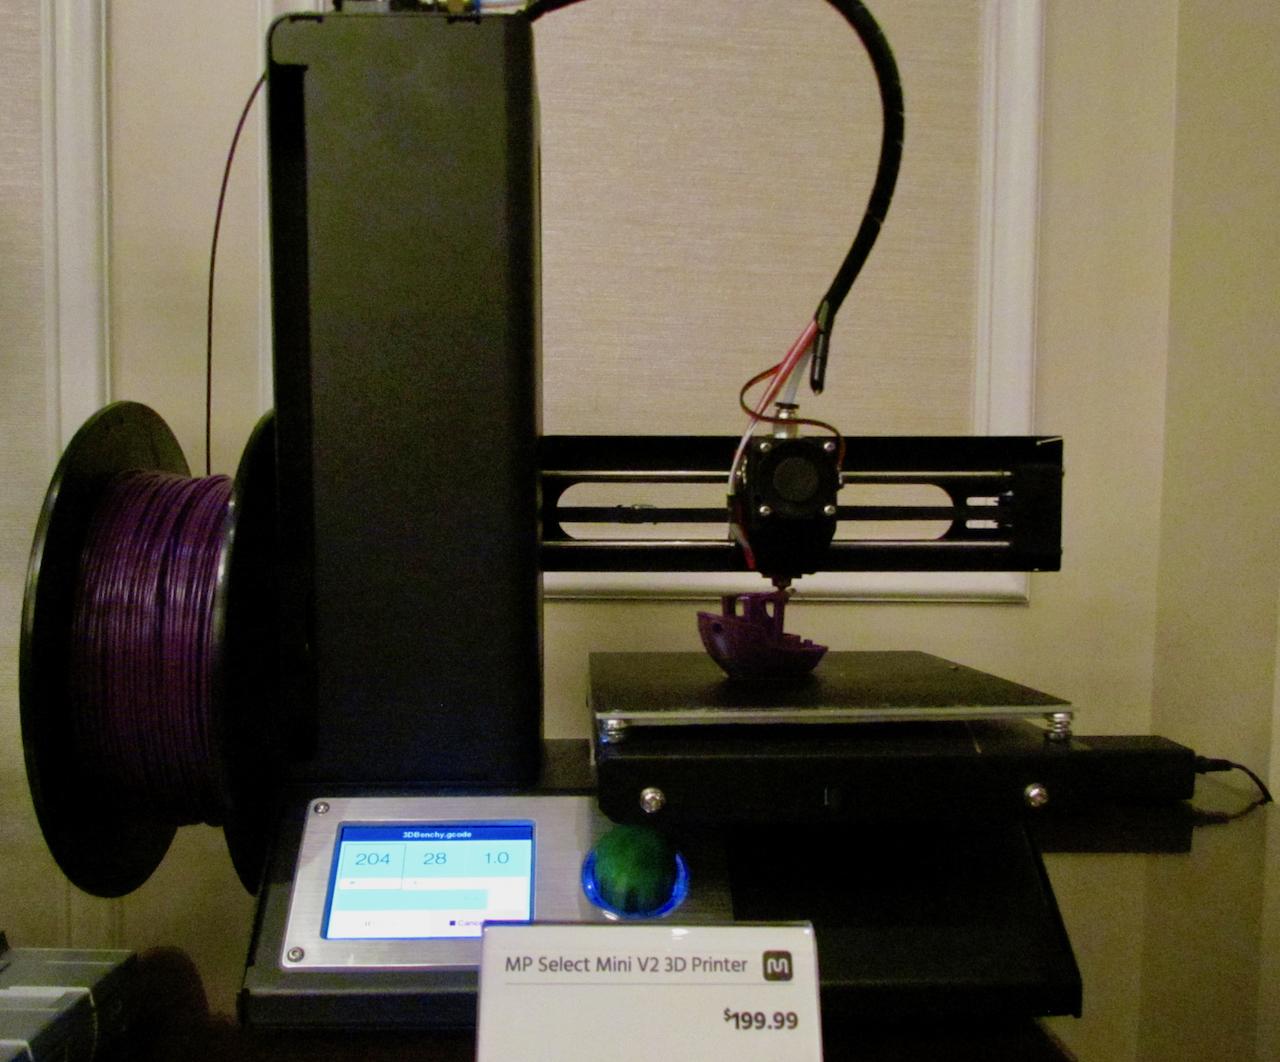 The new Monoprice Select Mini V2 desktop 3D printer